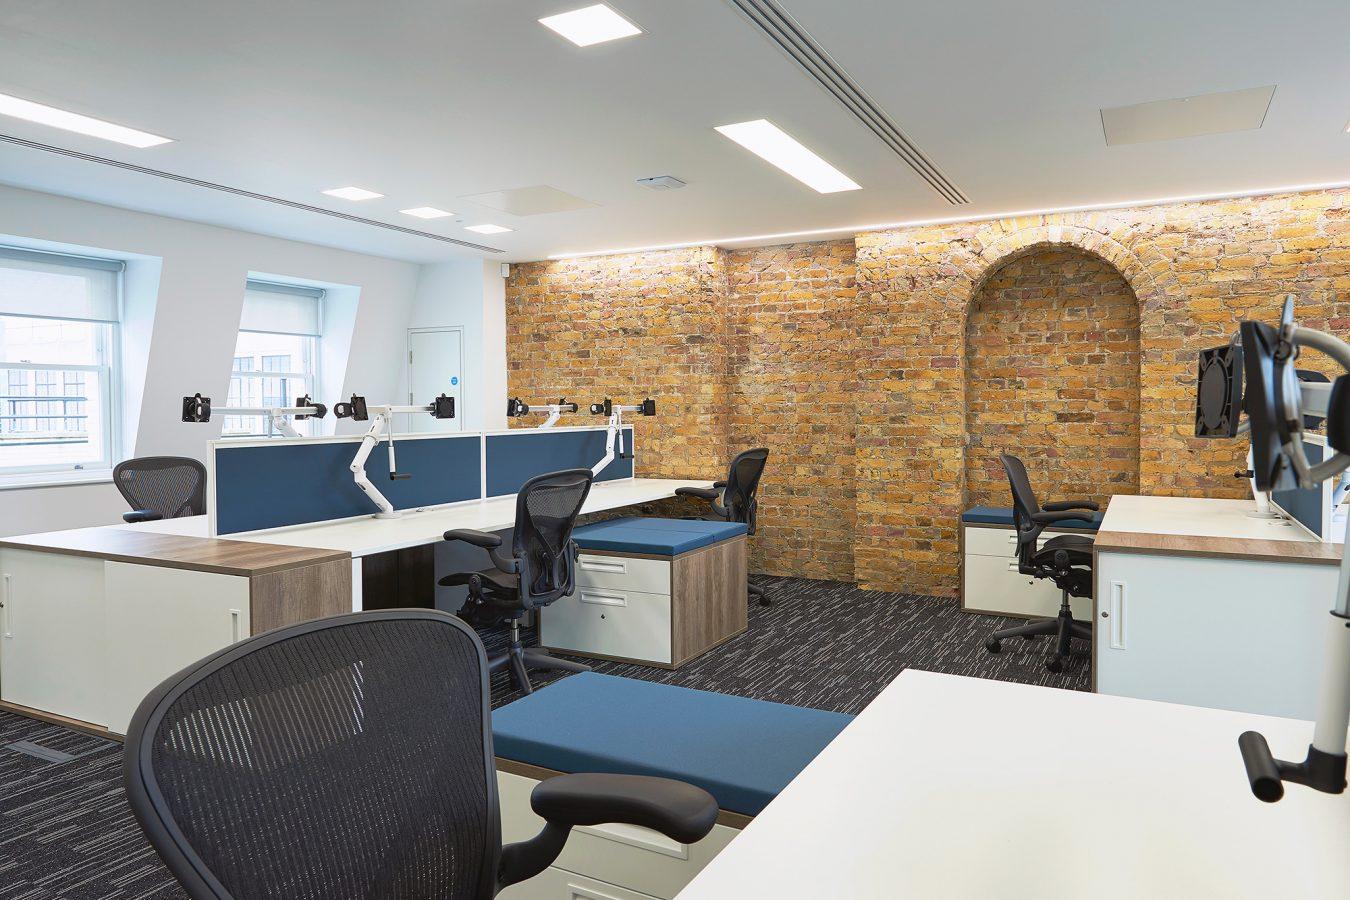 Modern office furniture ideas, exposed brickwork, industrial style design.